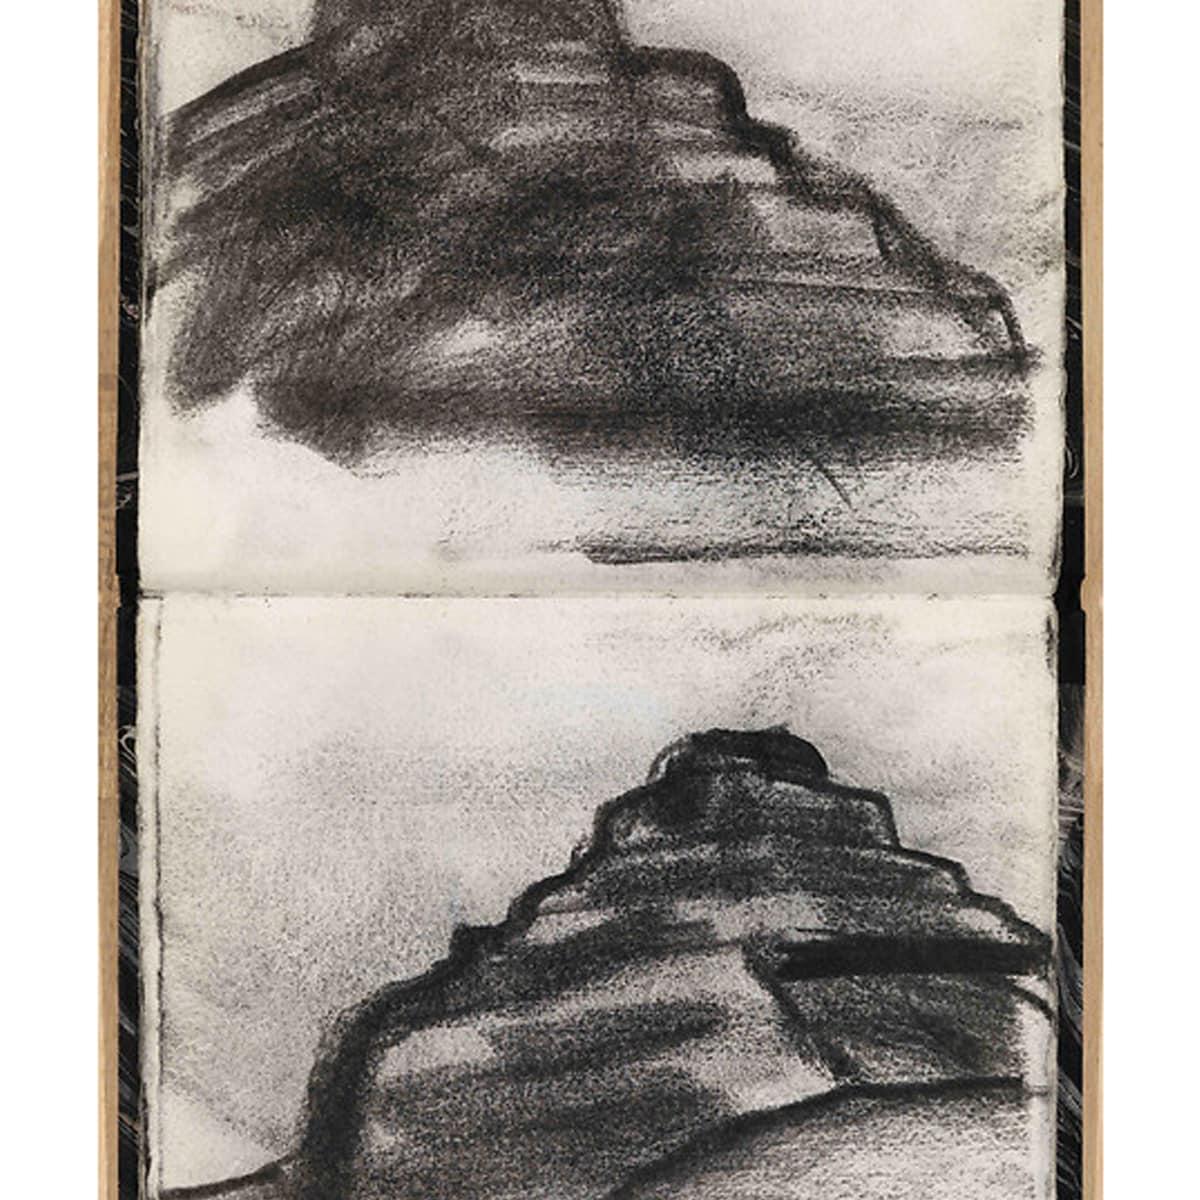 robert smithson richard serra essay The sculptor robert smithson began his career as a painter  richard serra,  robert carleton, robert smithson—sculpture, ithaca:.